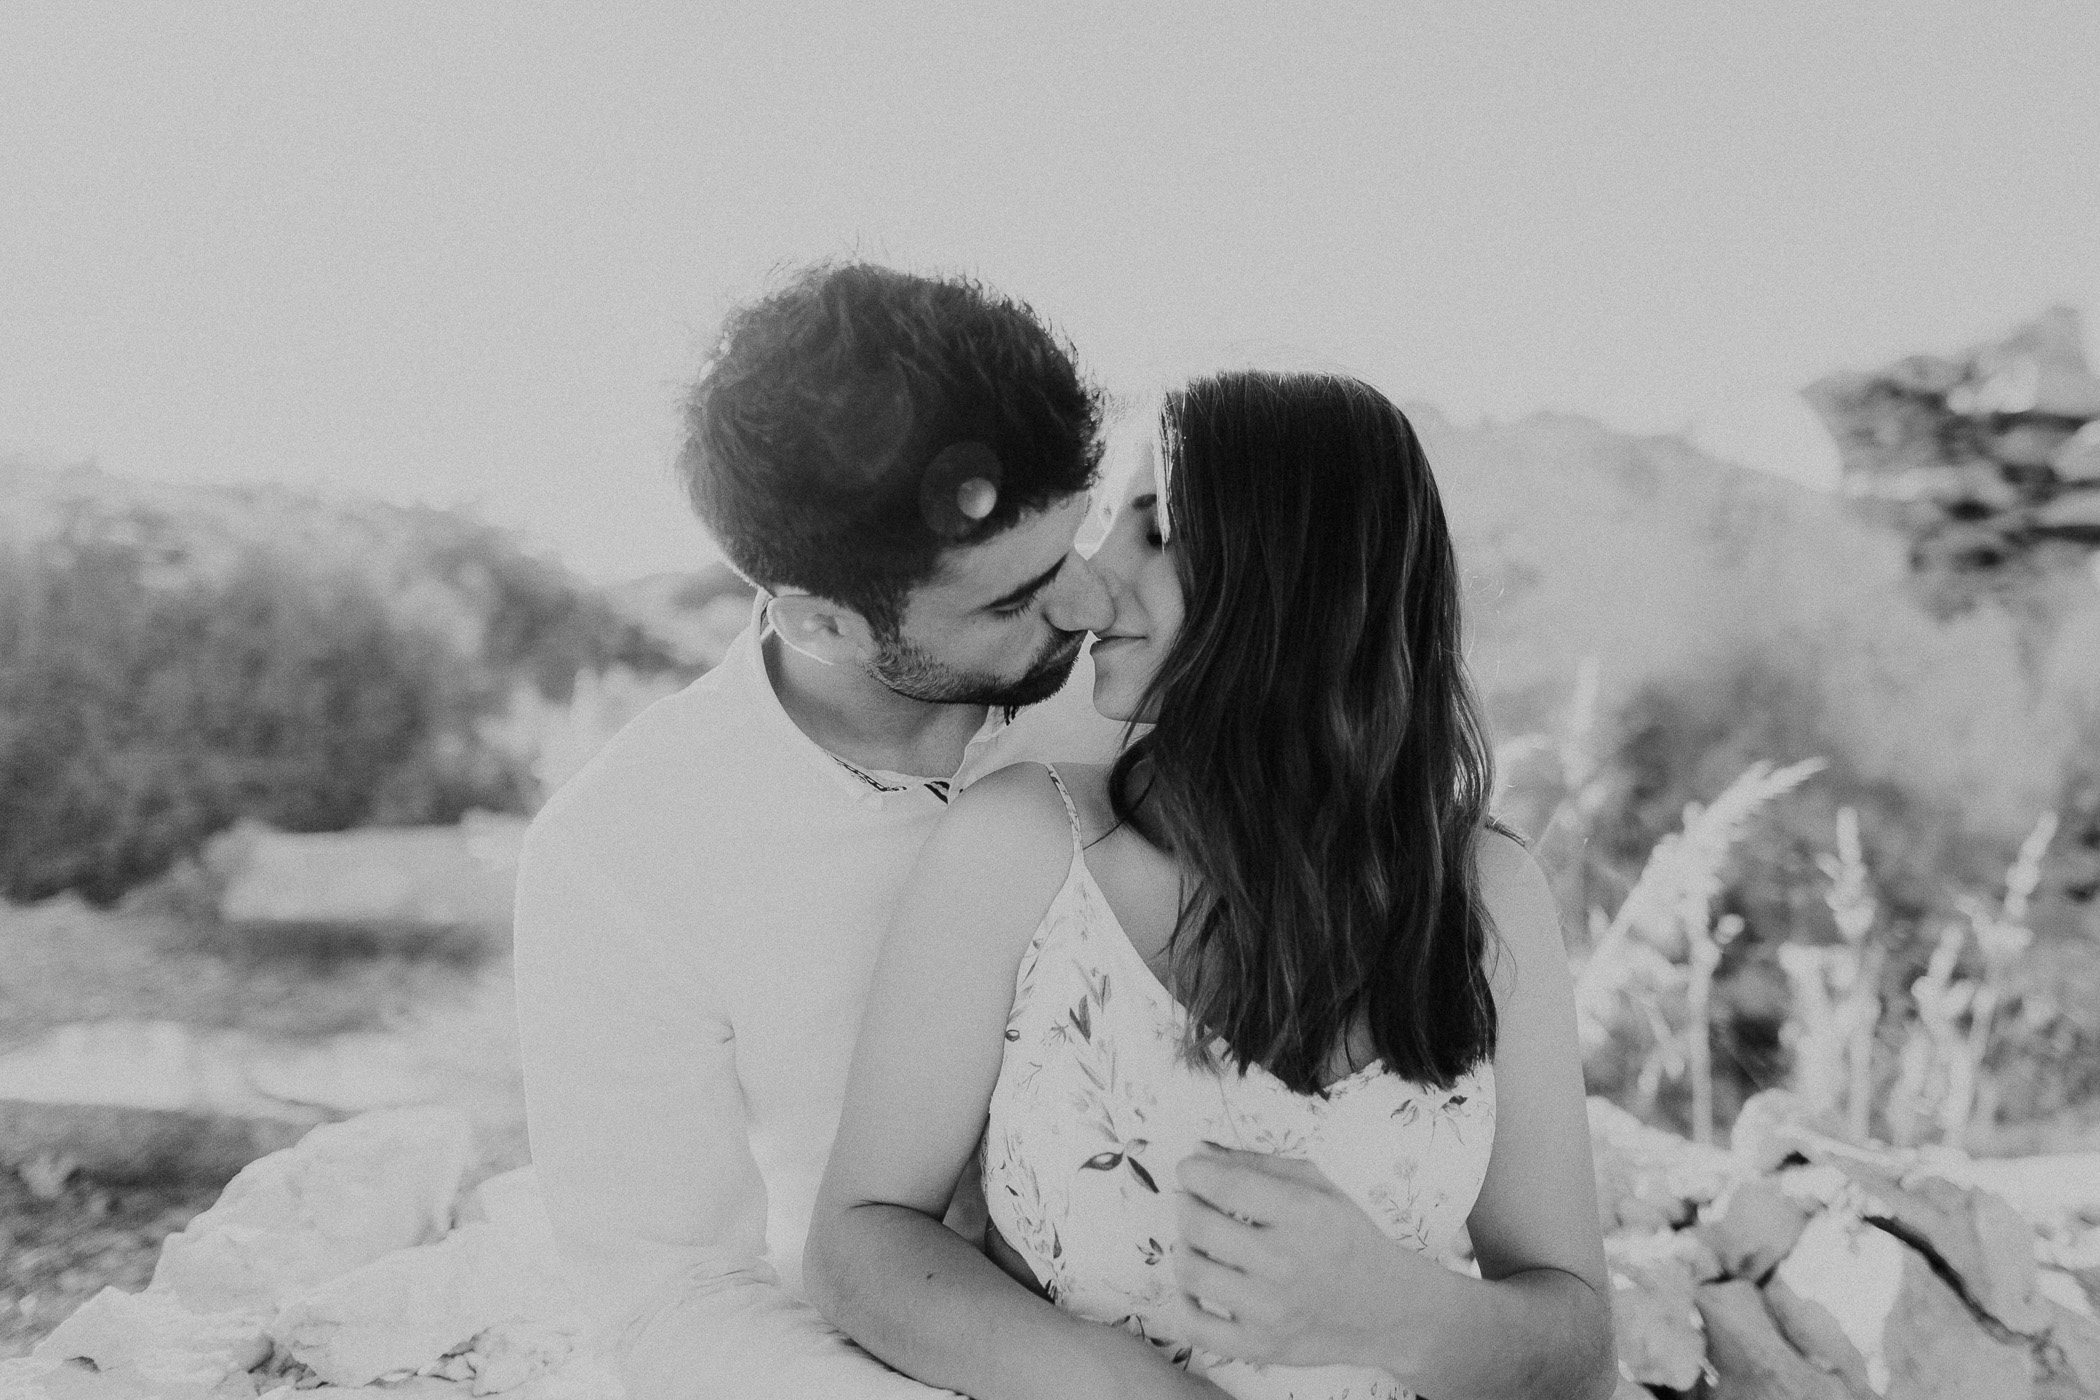 DanielaMarquardtPhotography_wedding_elopement_mallorca_spain_calapi_palma_lauraandtoni_377